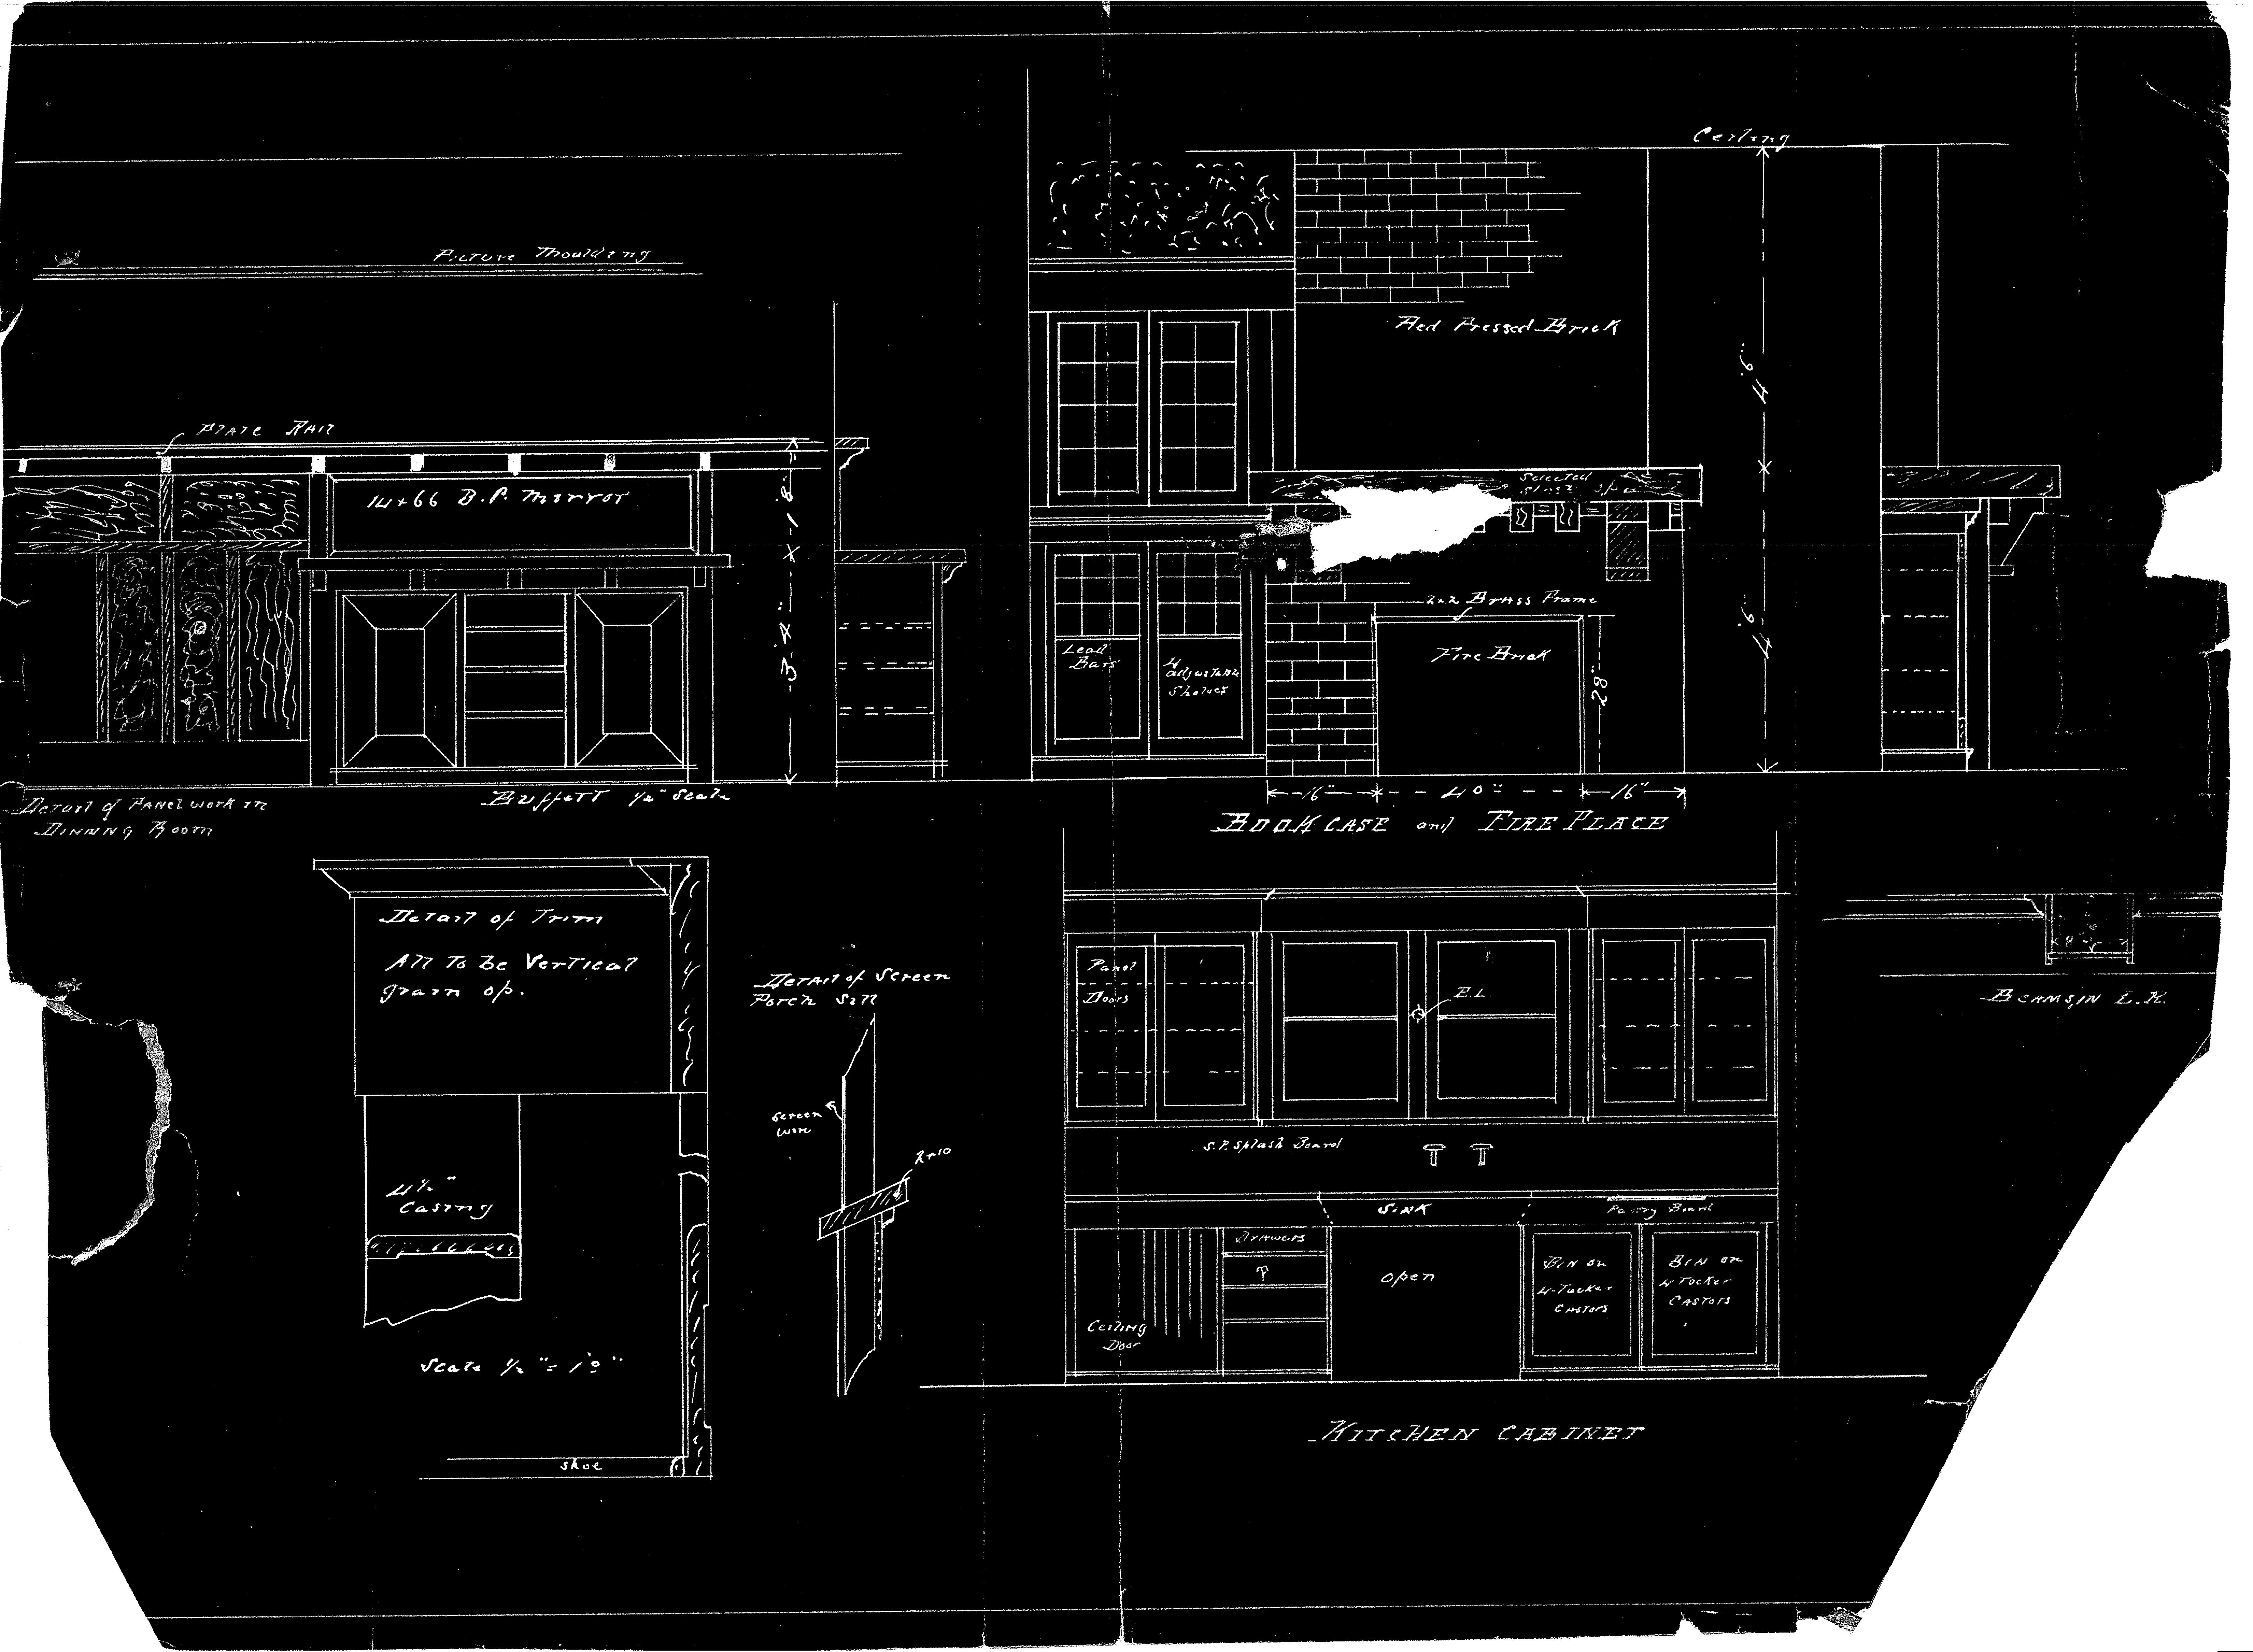 4465 5th Street Inside Details